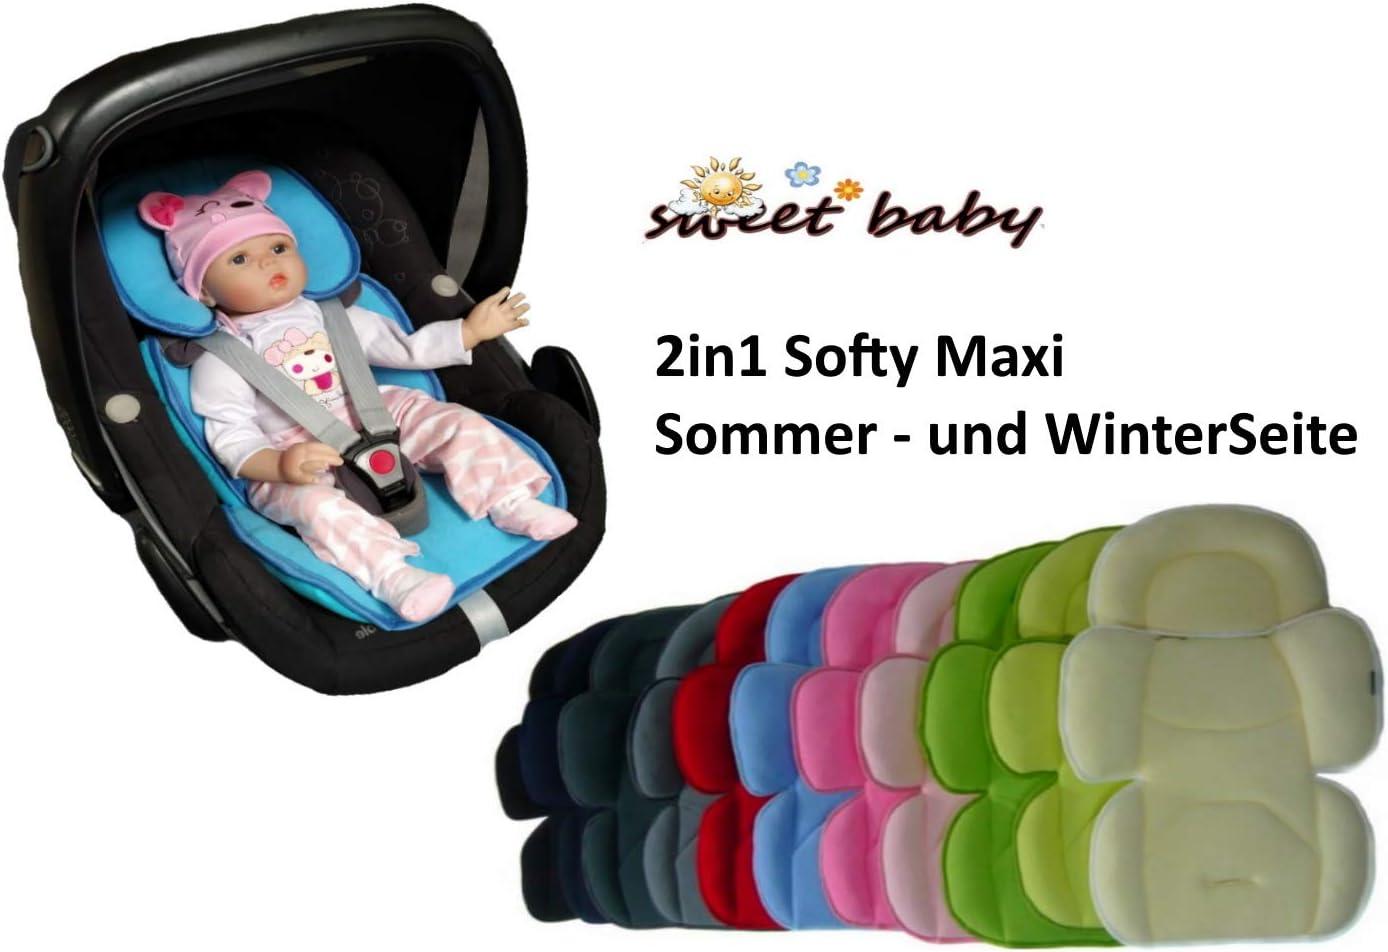 Sweet Baby ** SOFTY MAXI AZUL CLARO ** Cojín reductor para silla ...